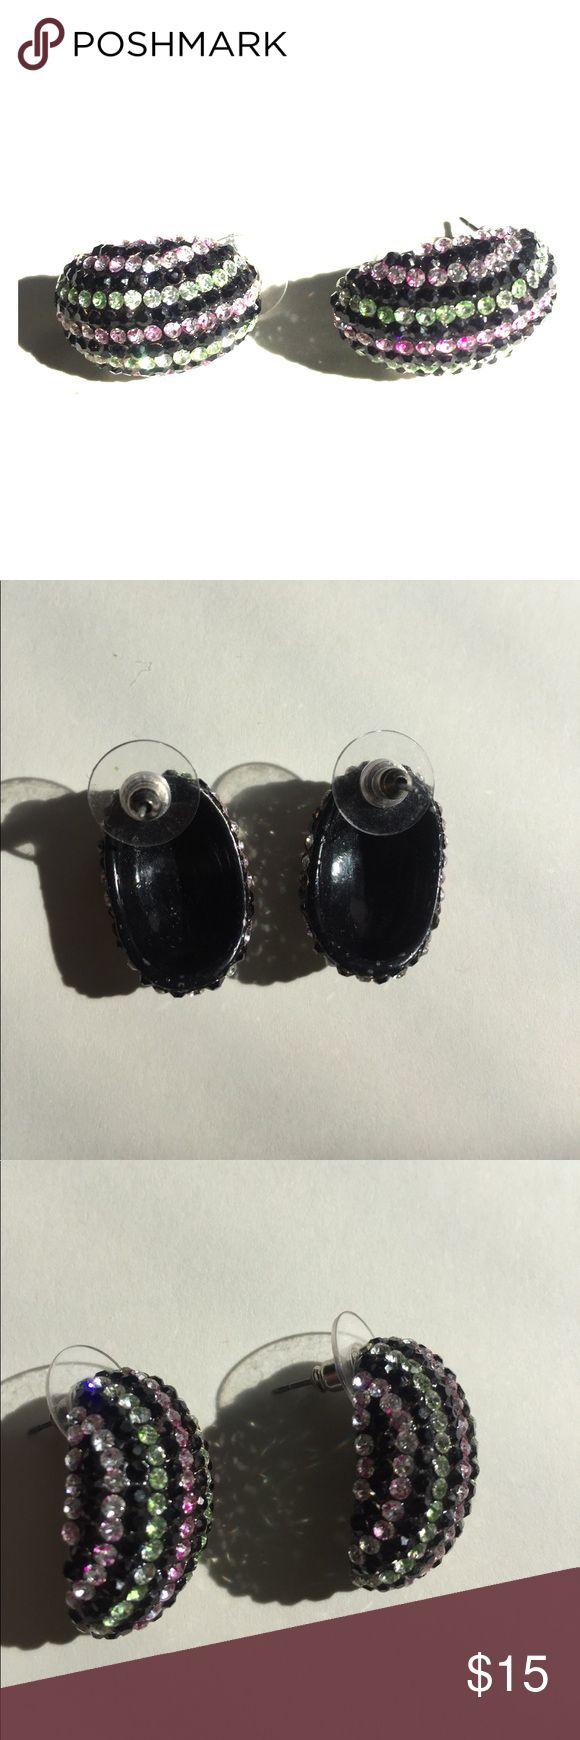 Custom rhinestone prom/pageant earrings Custom made rhinestone earrings, green, pink, and, black Jewelry Earrings